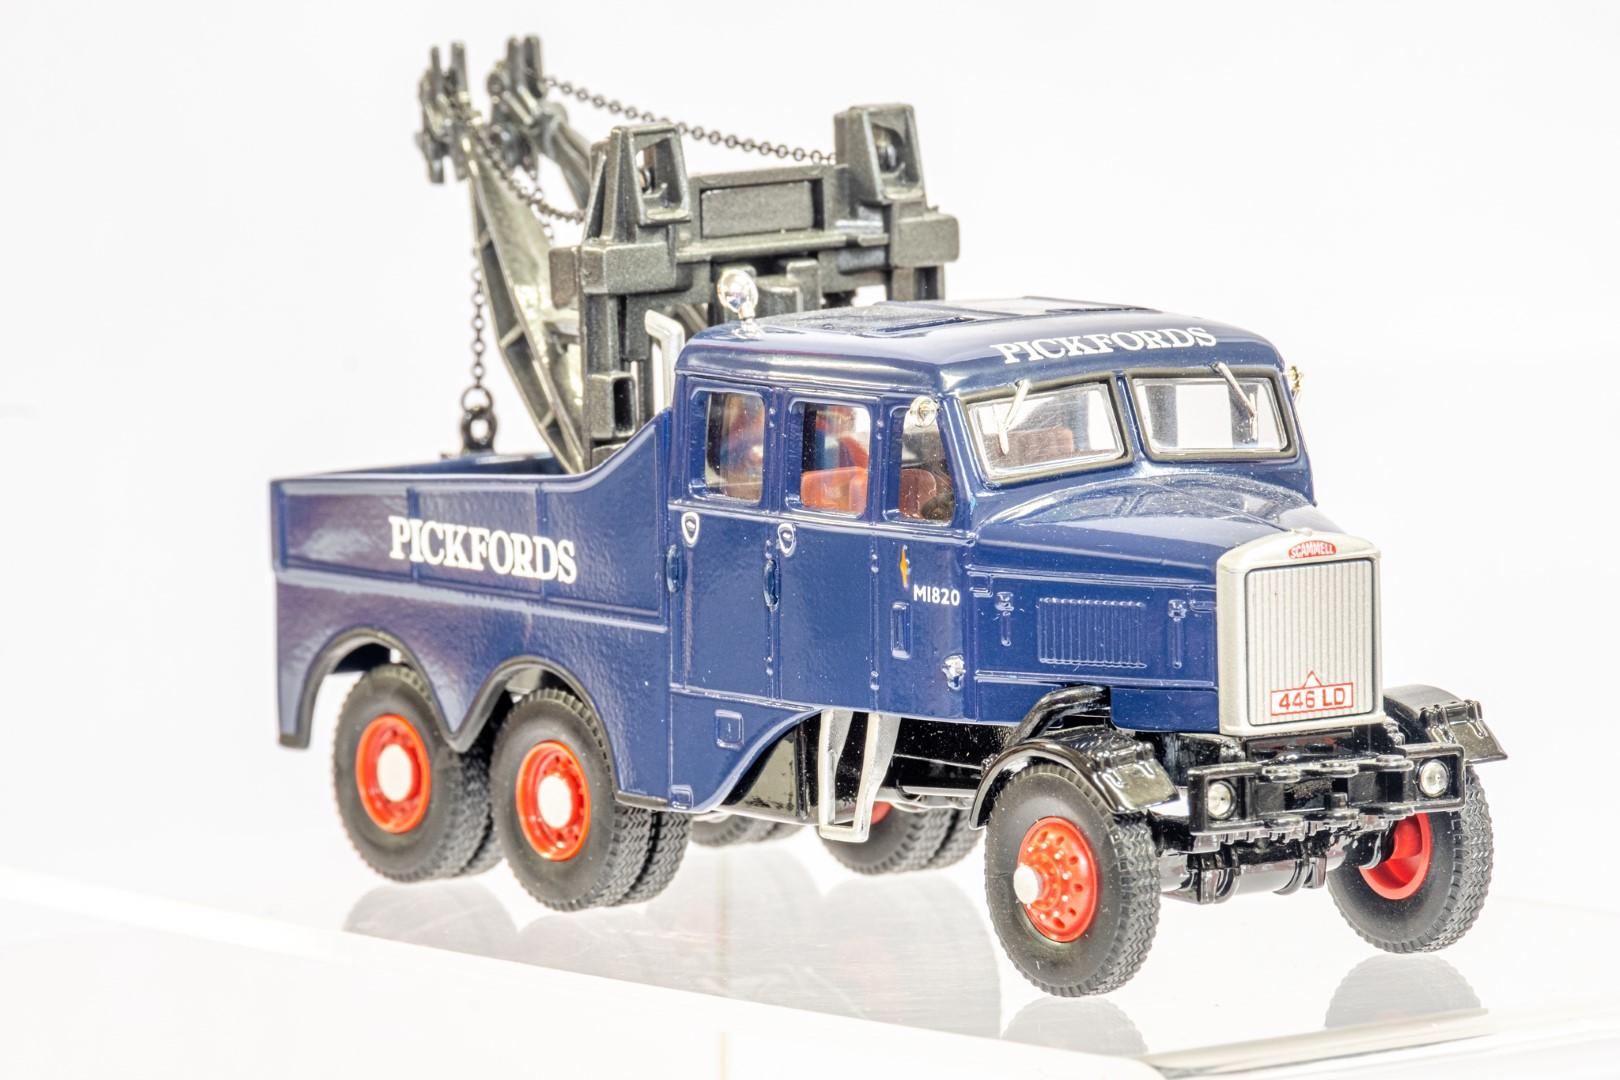 Corgi Pickfords Scammell Constructor Wrecker - Image 8 of 8